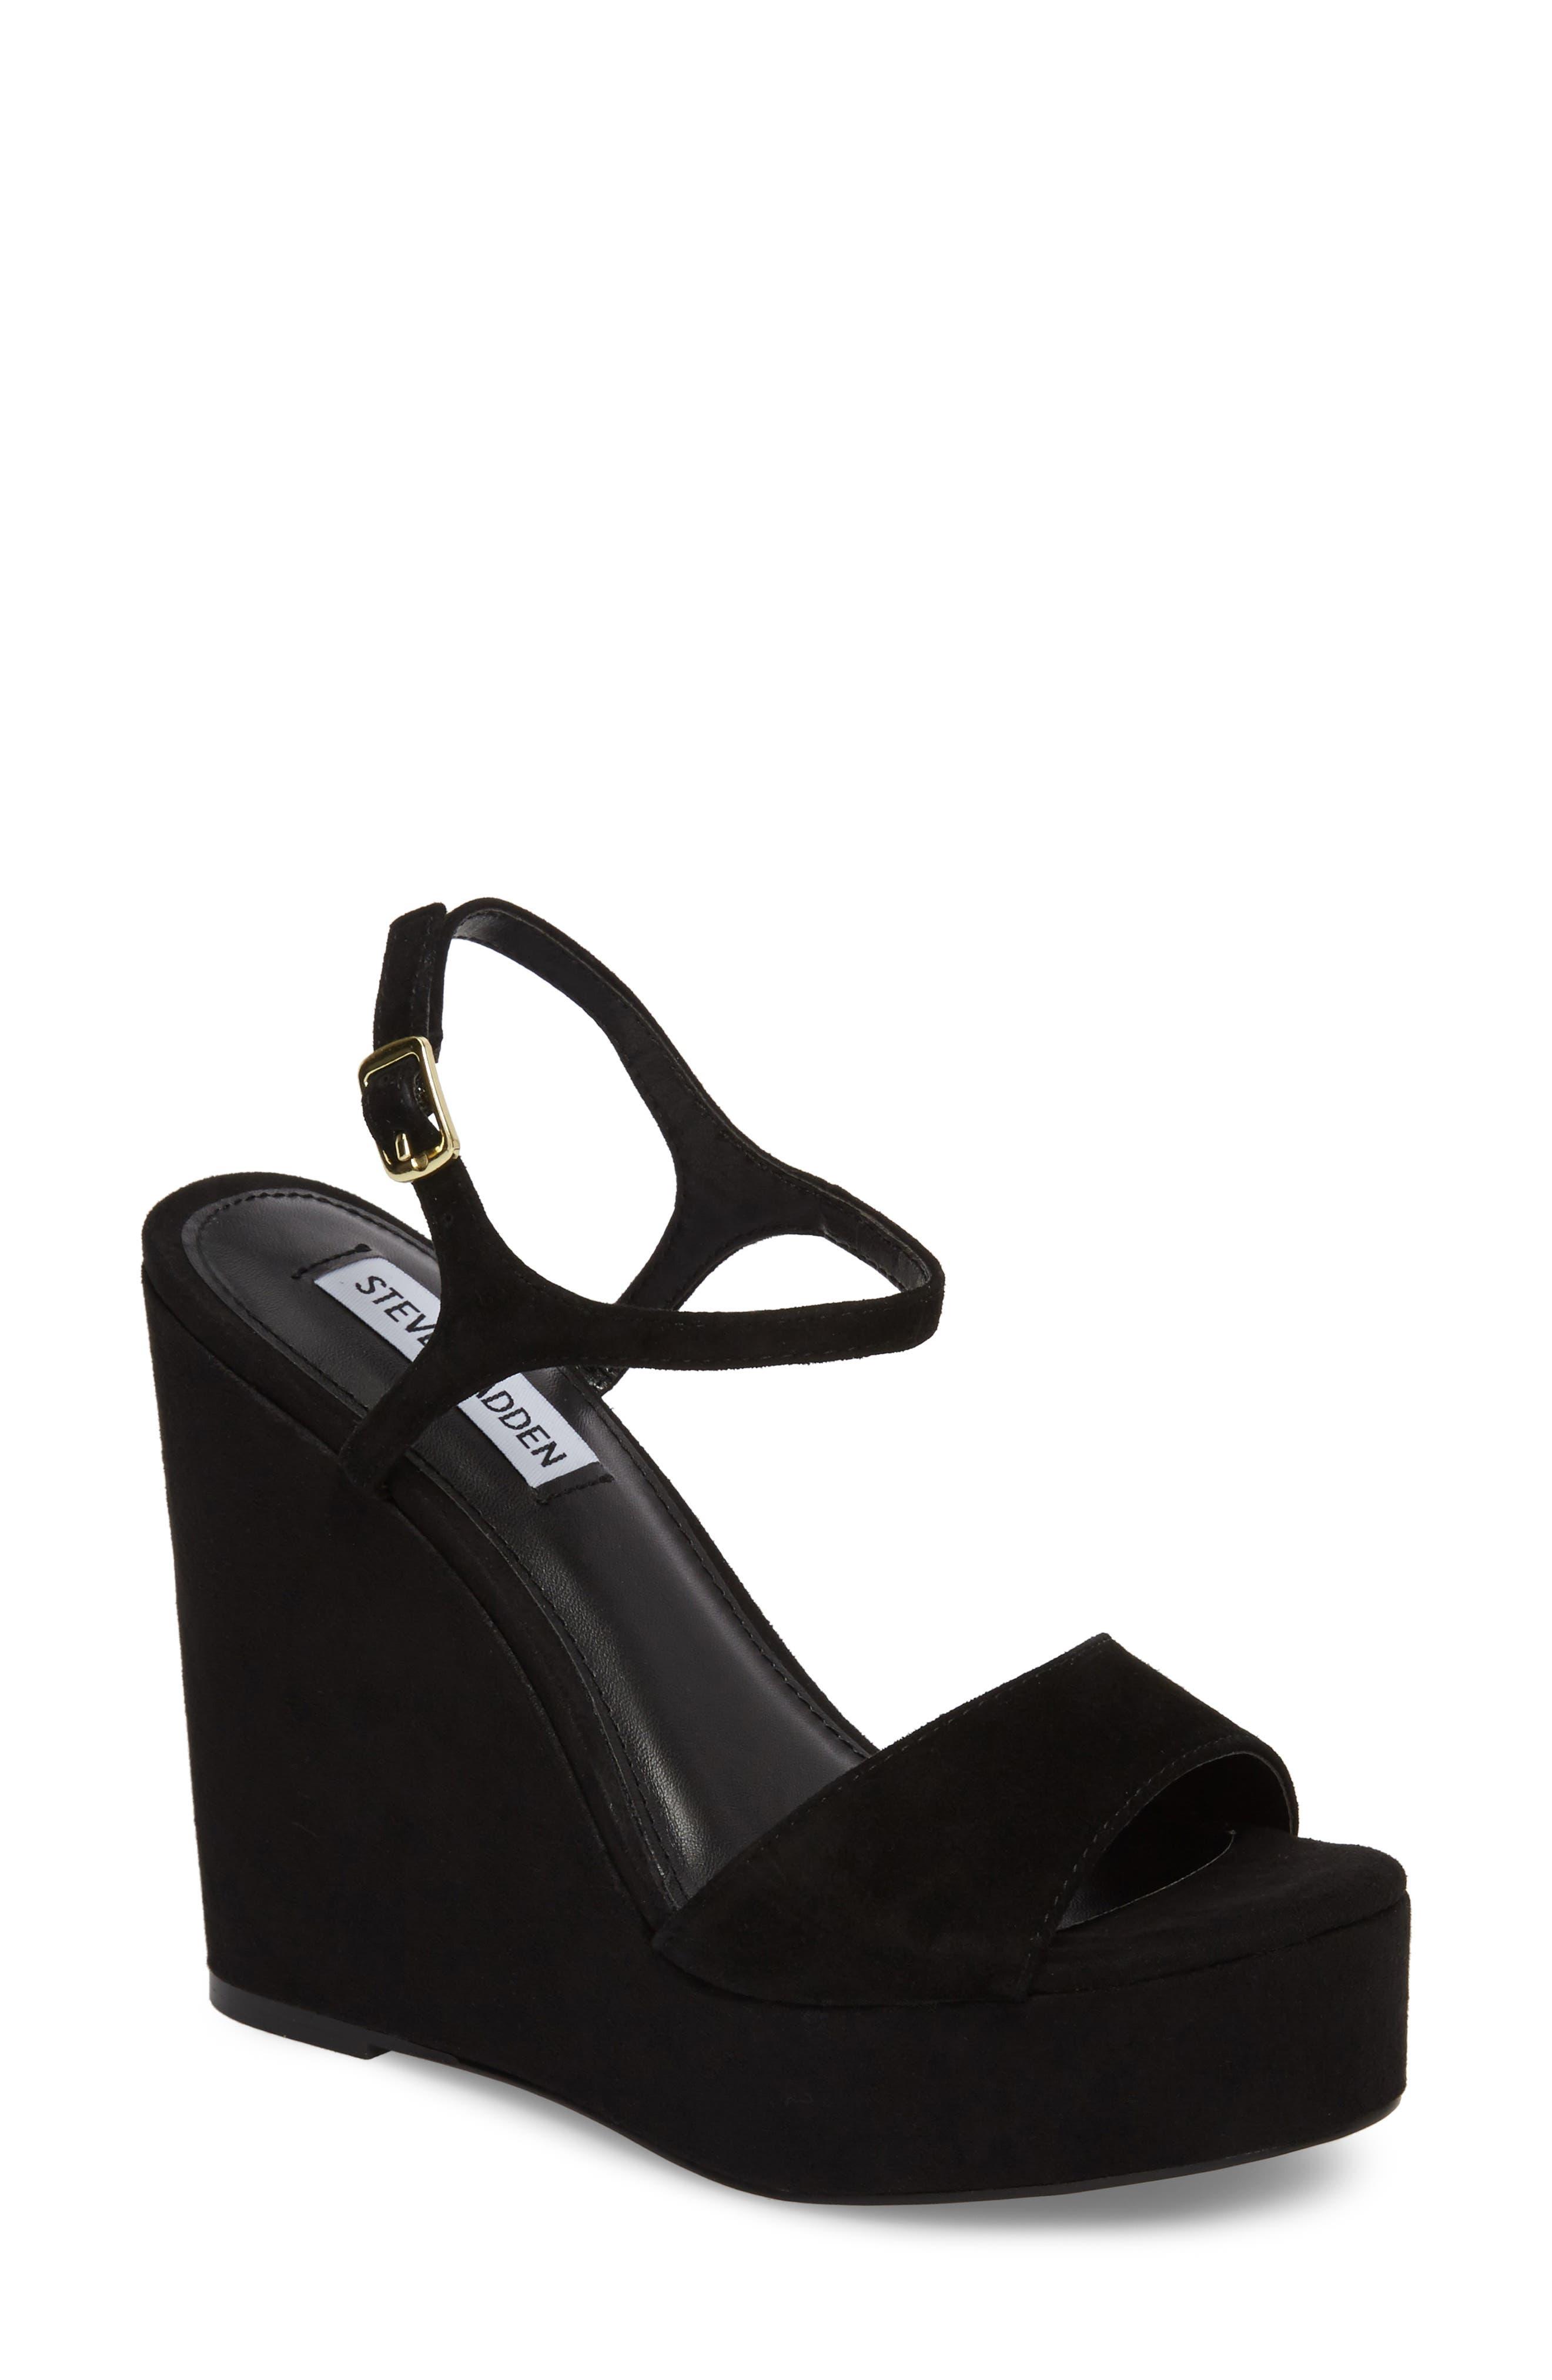 Truce Wedge Sandal,                         Main,                         color, Black Suede